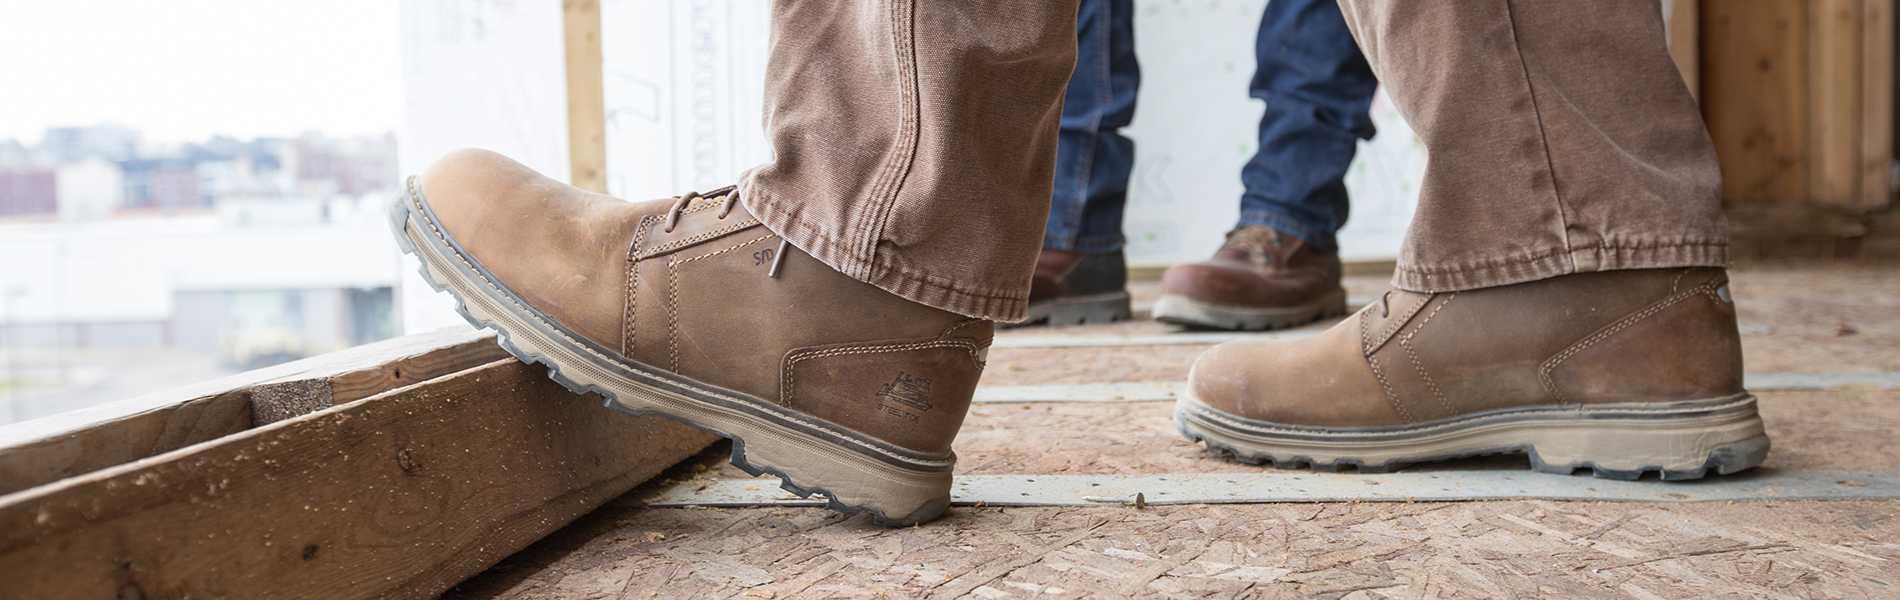 40973cd7a31 Parker Steel Toe Work Boot